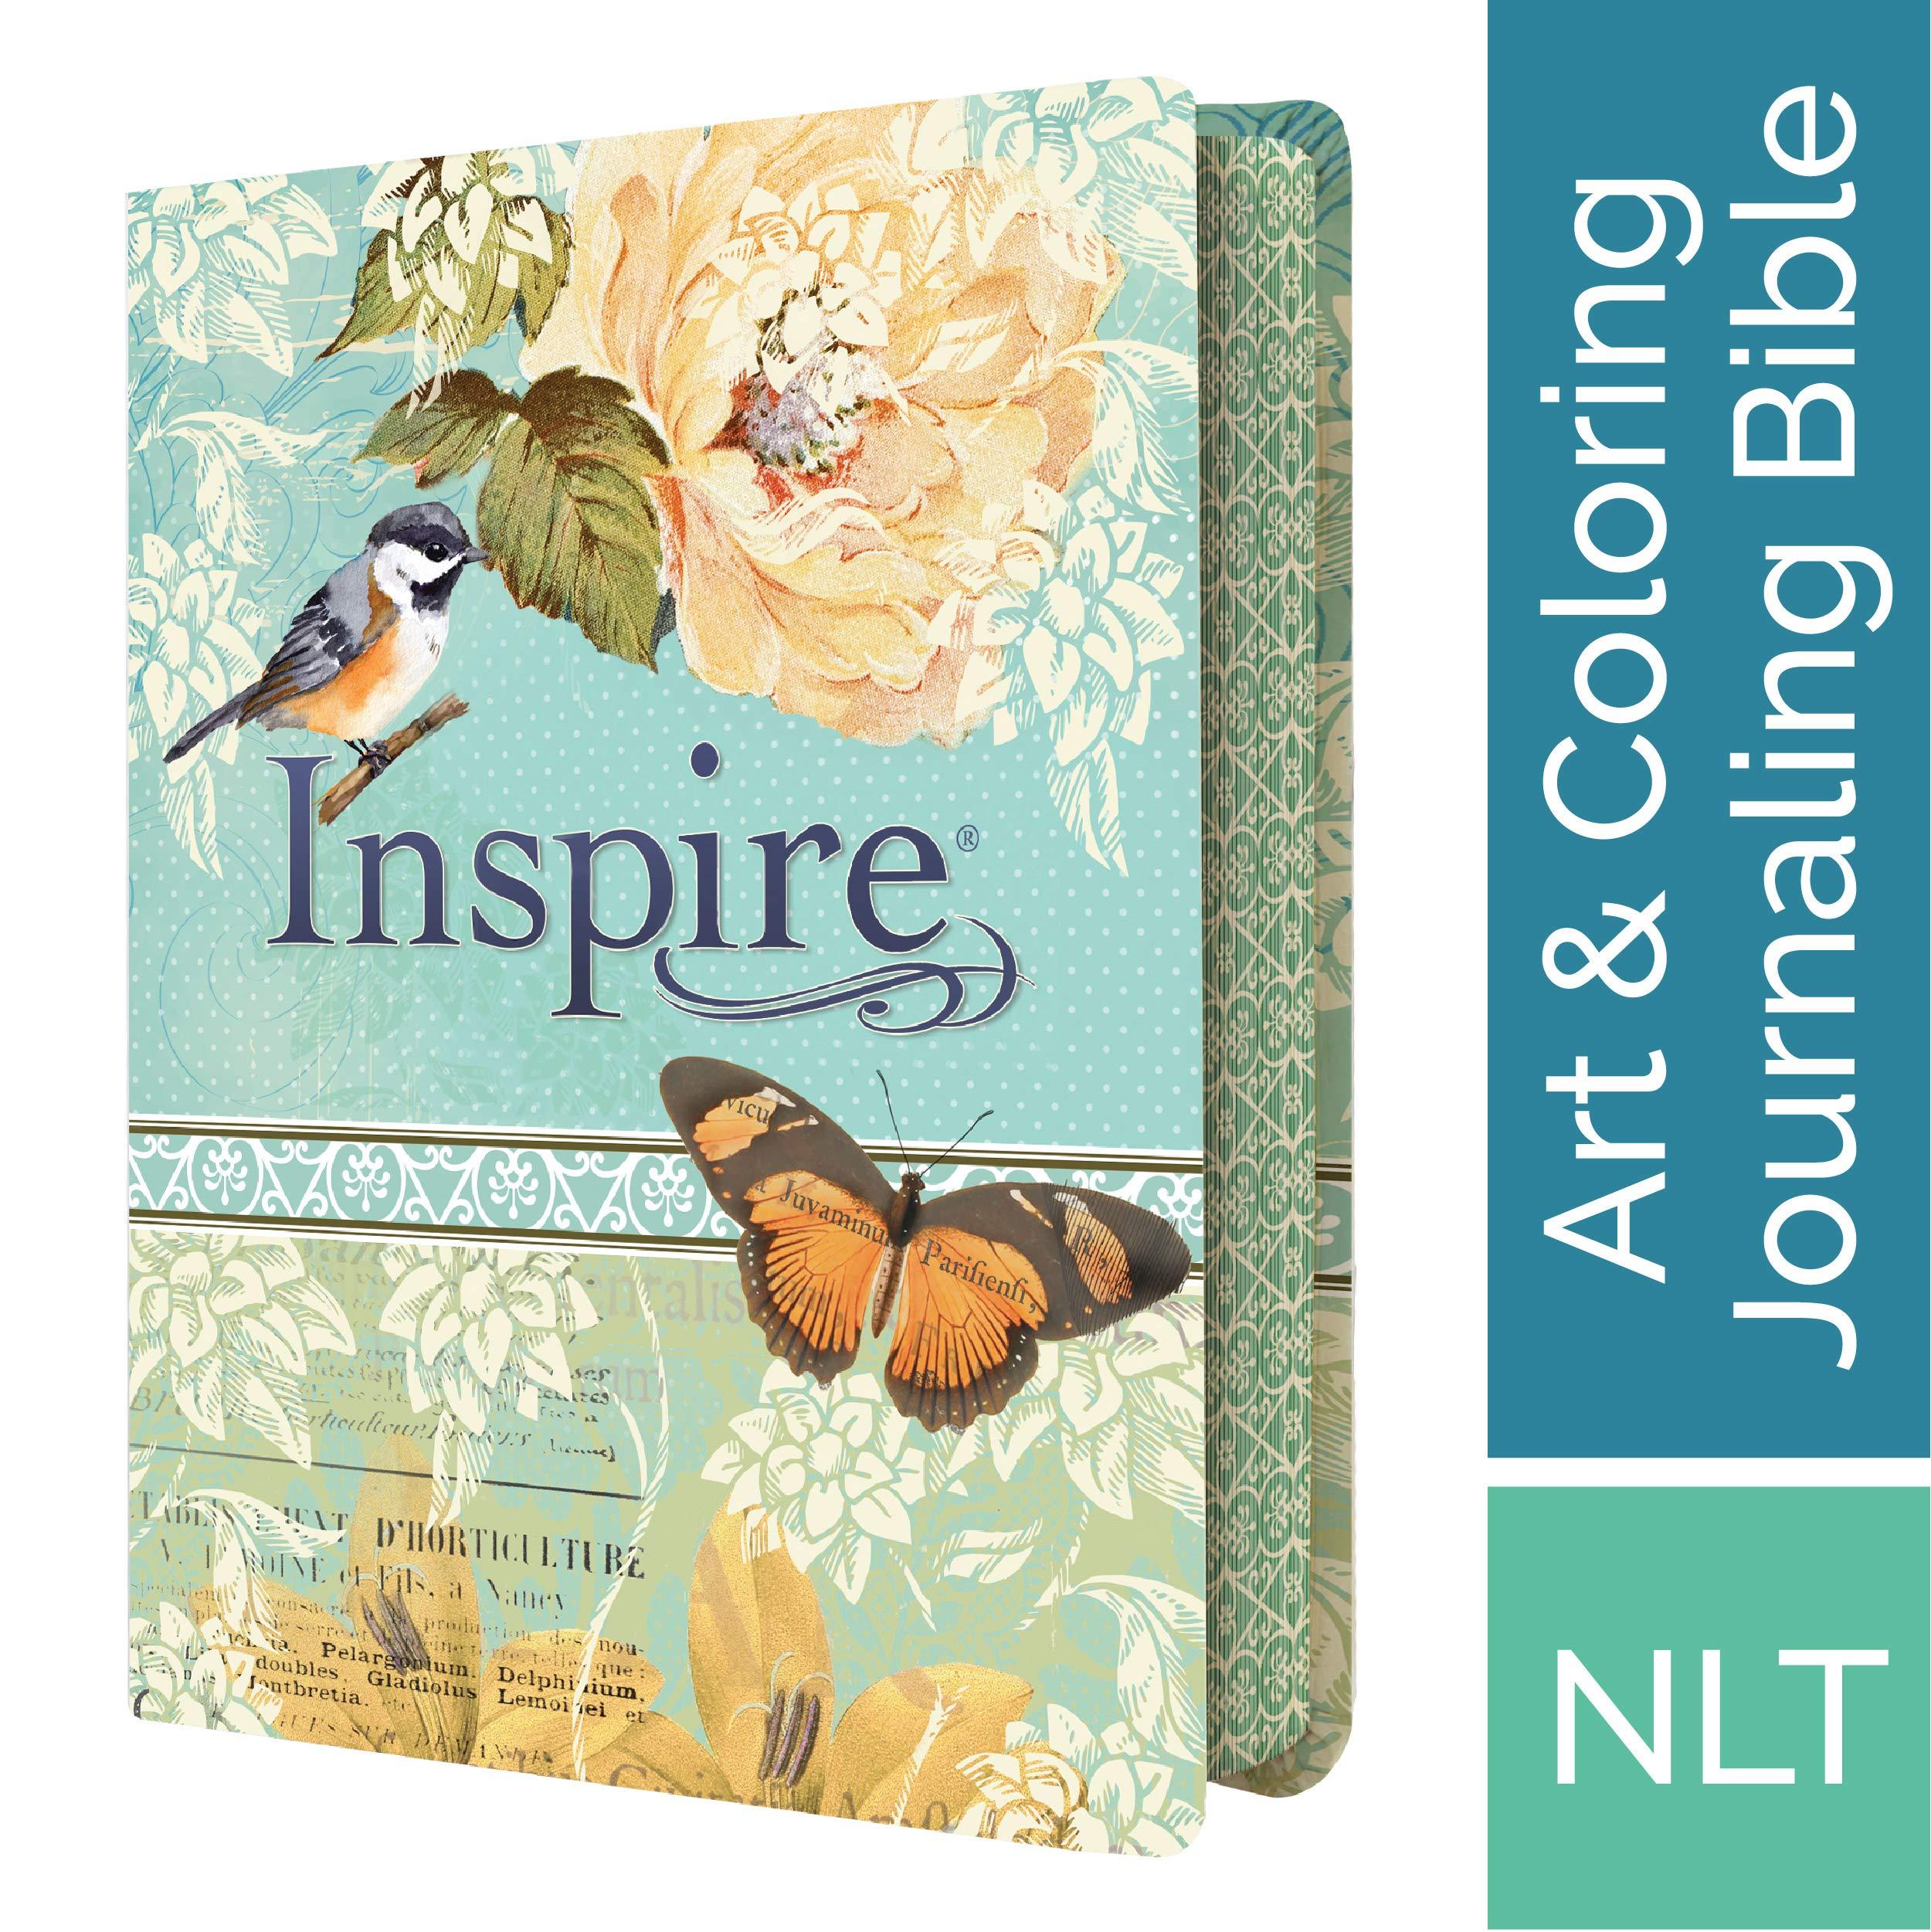 Buy NLT Inspire Bible: The Bible for Creative Journaling (Inspire